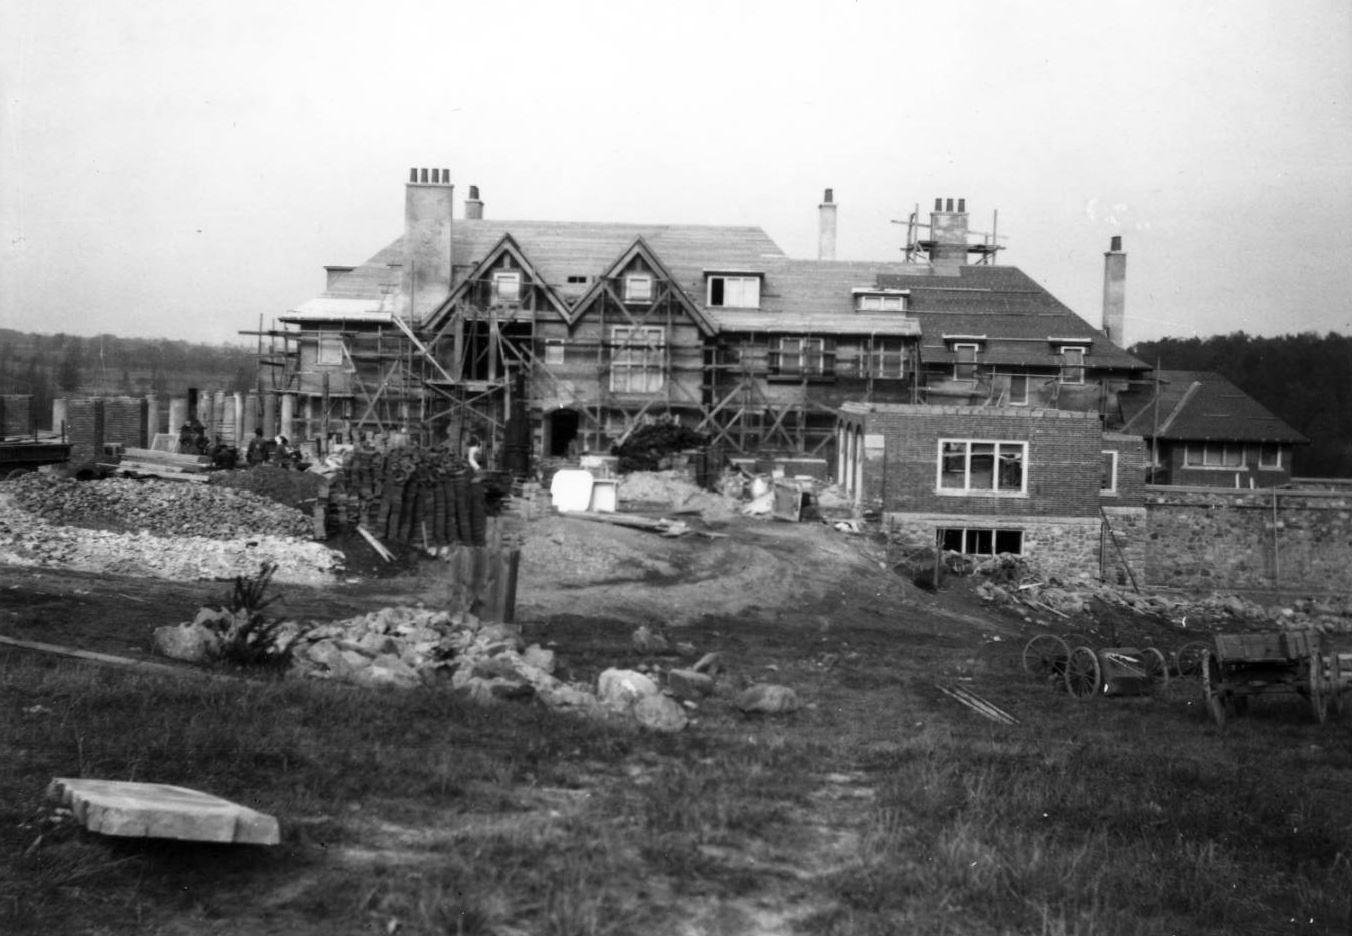 Cranbrook House Construction James Scripps Booth c 1907